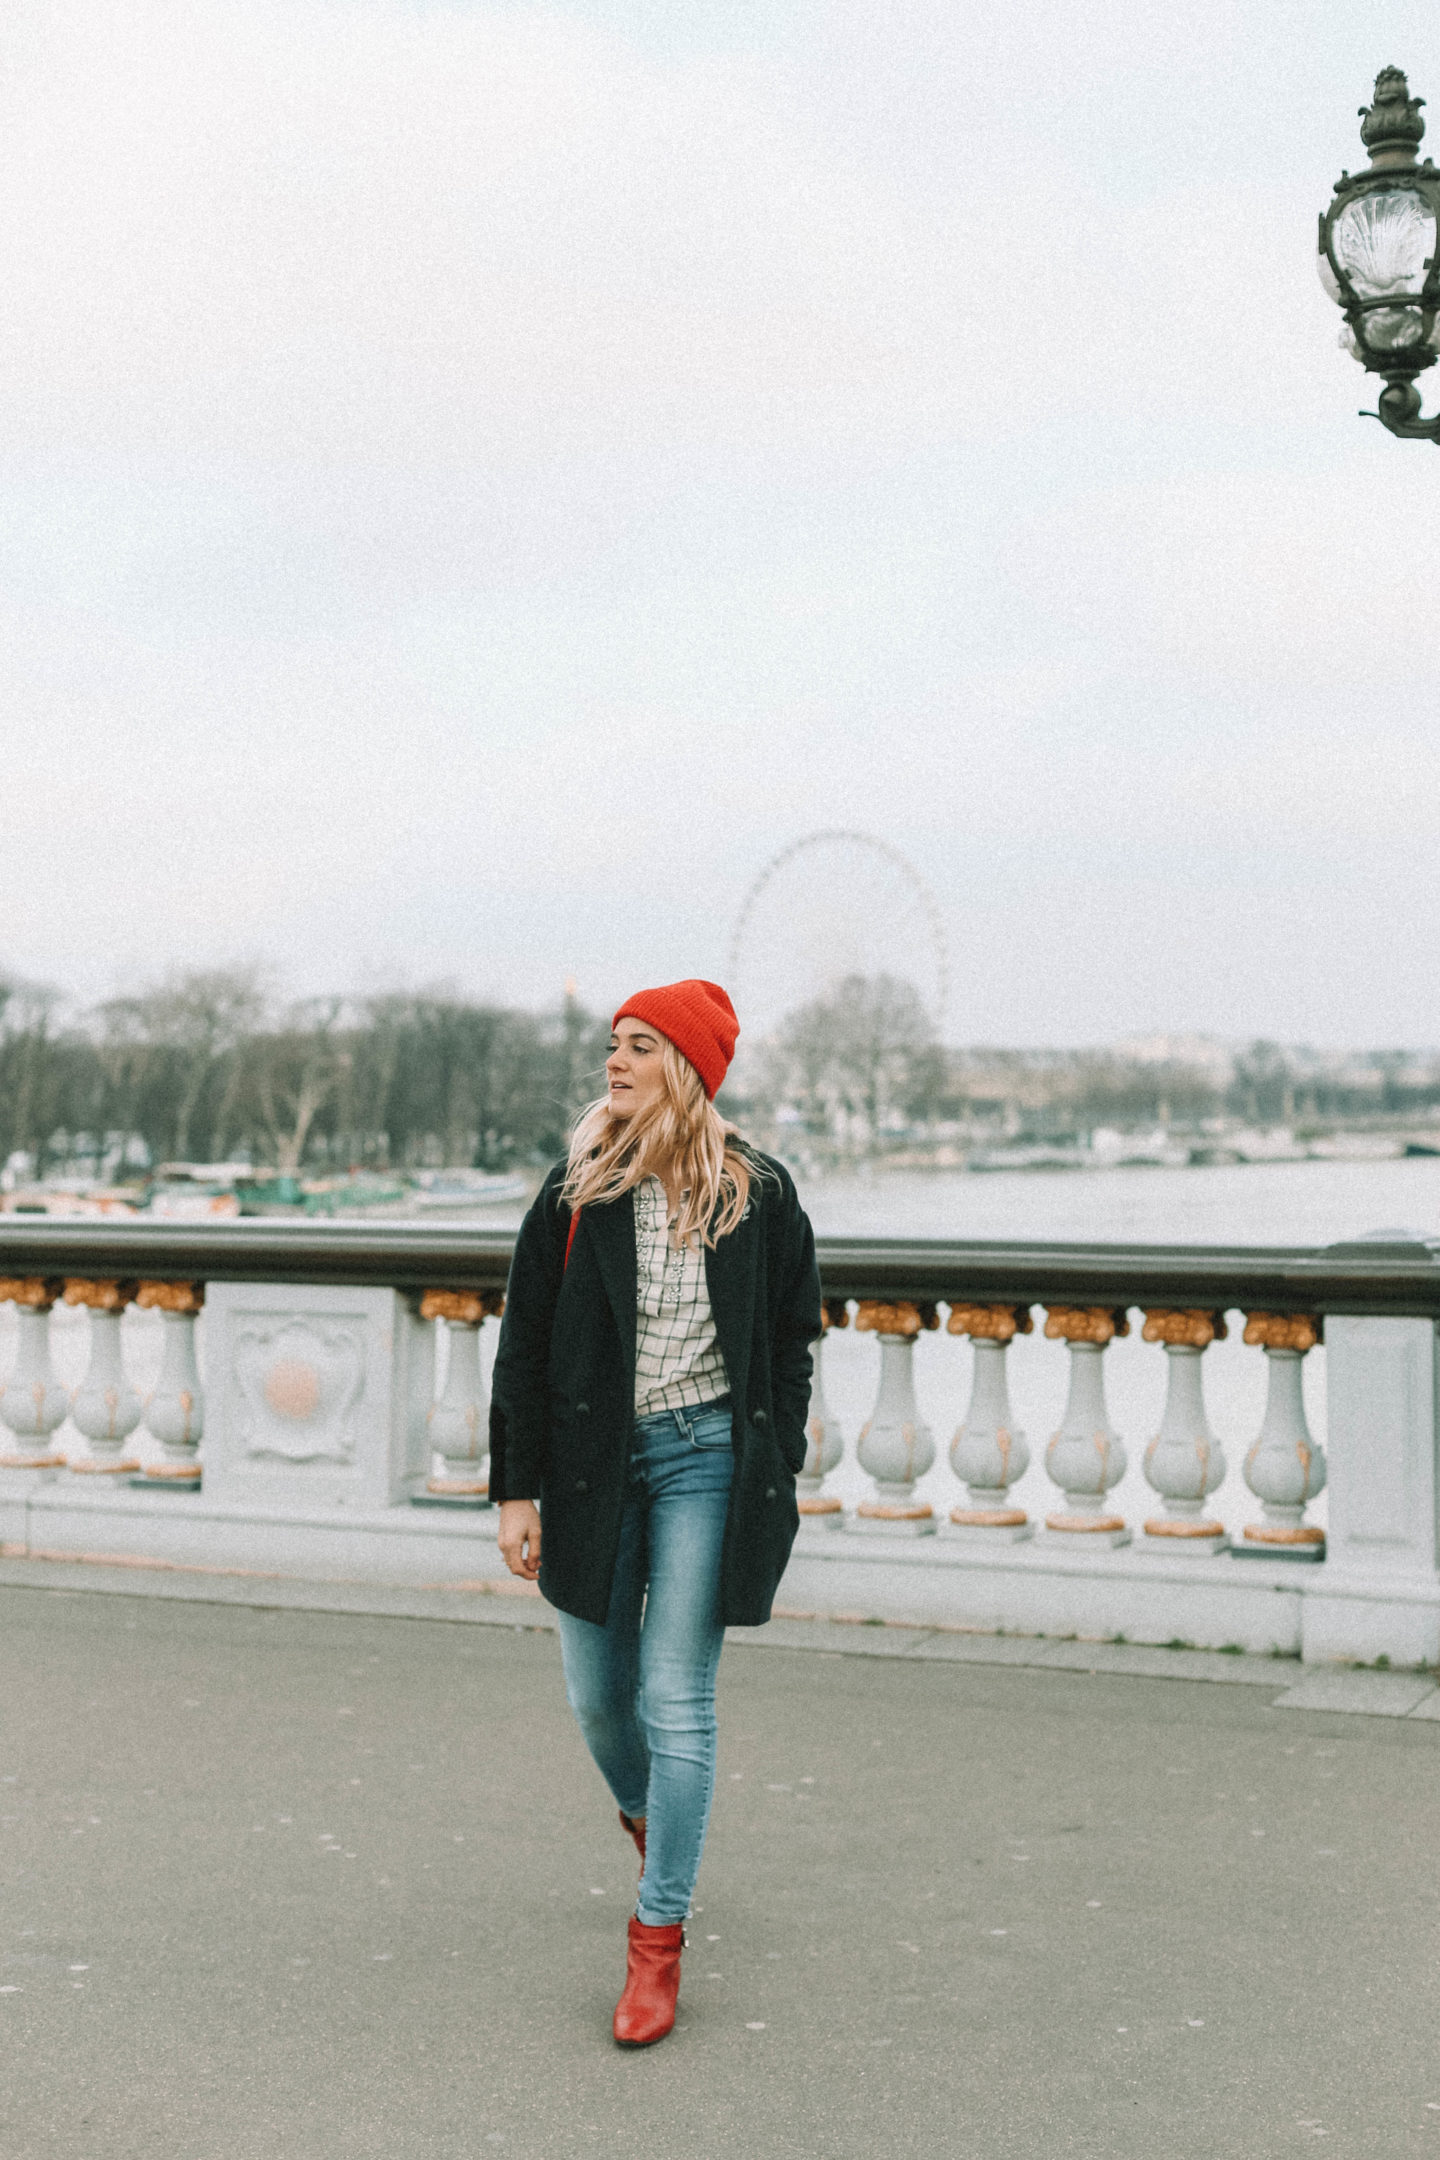 Blog voyages - Blondie Baby blog mode et voyages